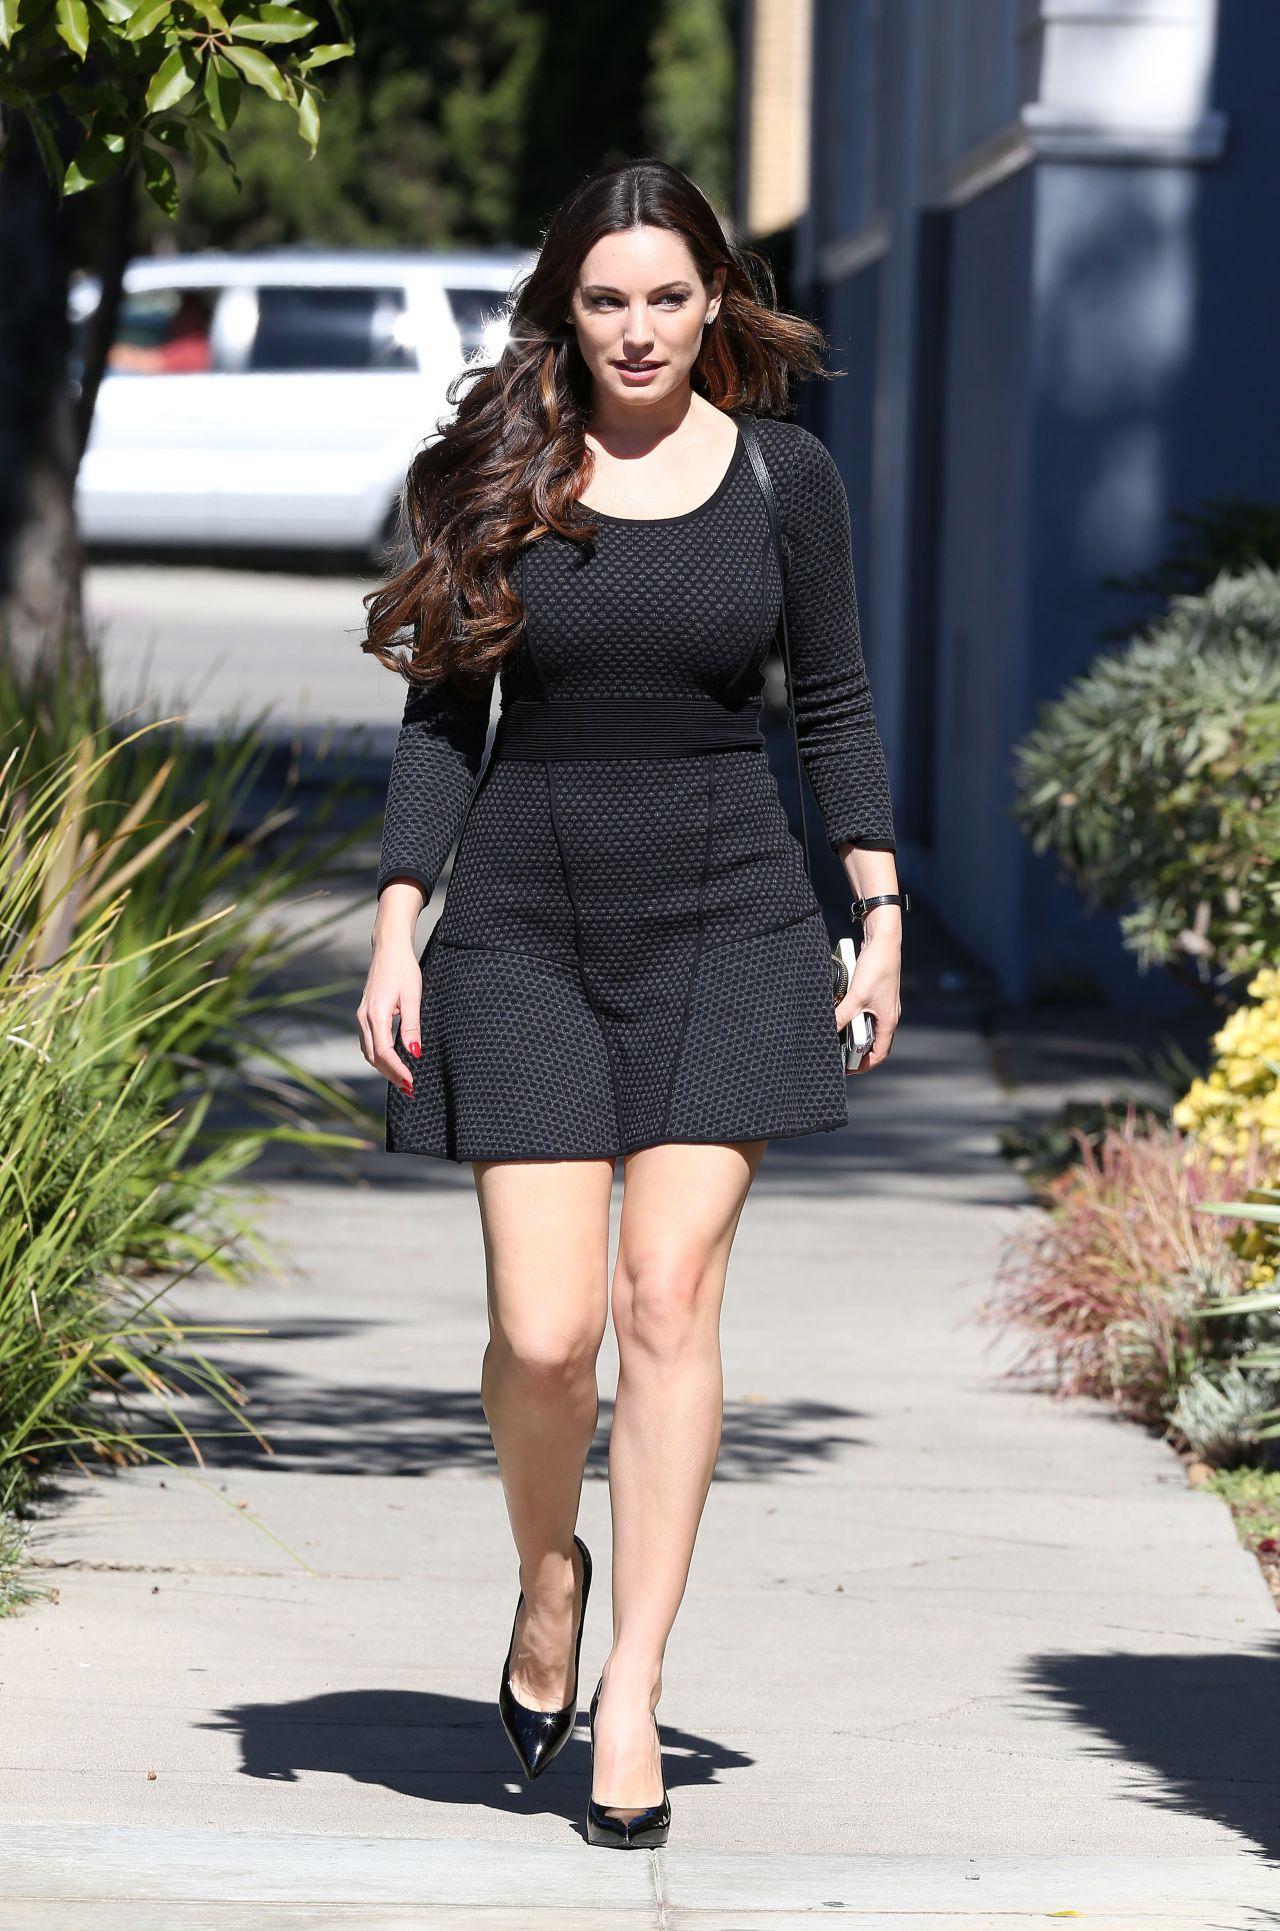 Kelly Brook In A Short Skirt